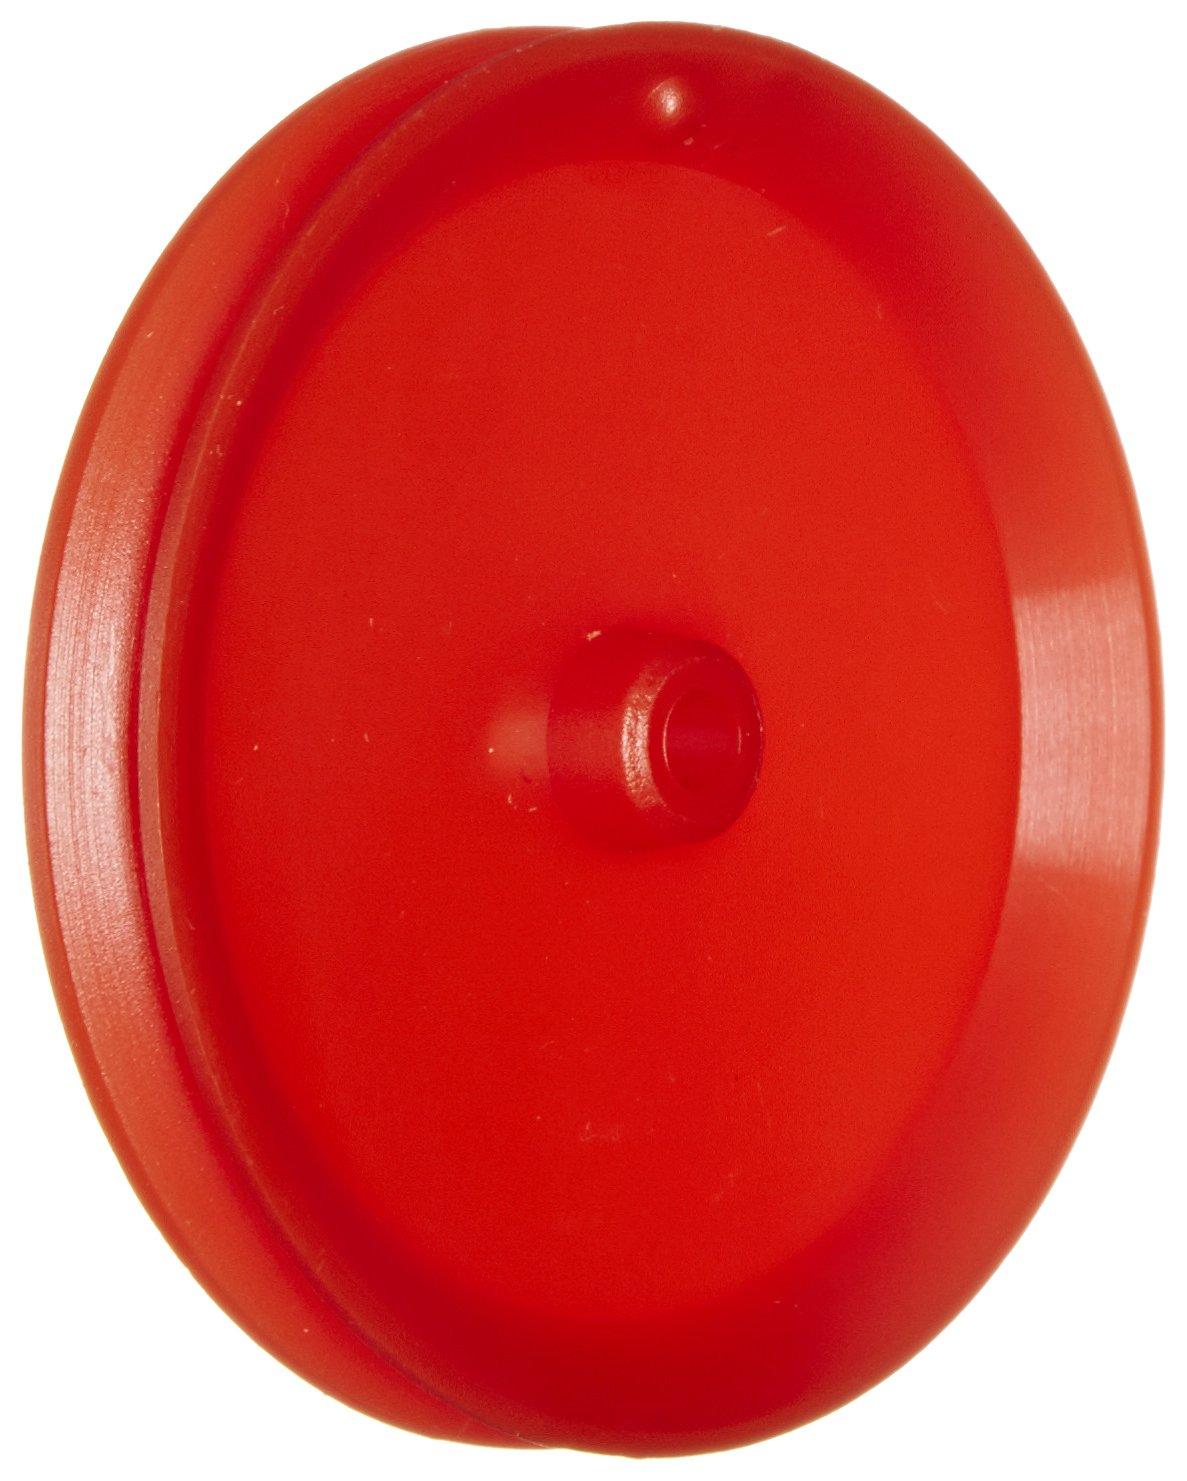 Ajax Scientific Plastic Loose Pulley, 50mm Diameter, 4mm Center Hole Diameter (Pack of 10) ME410-0050S